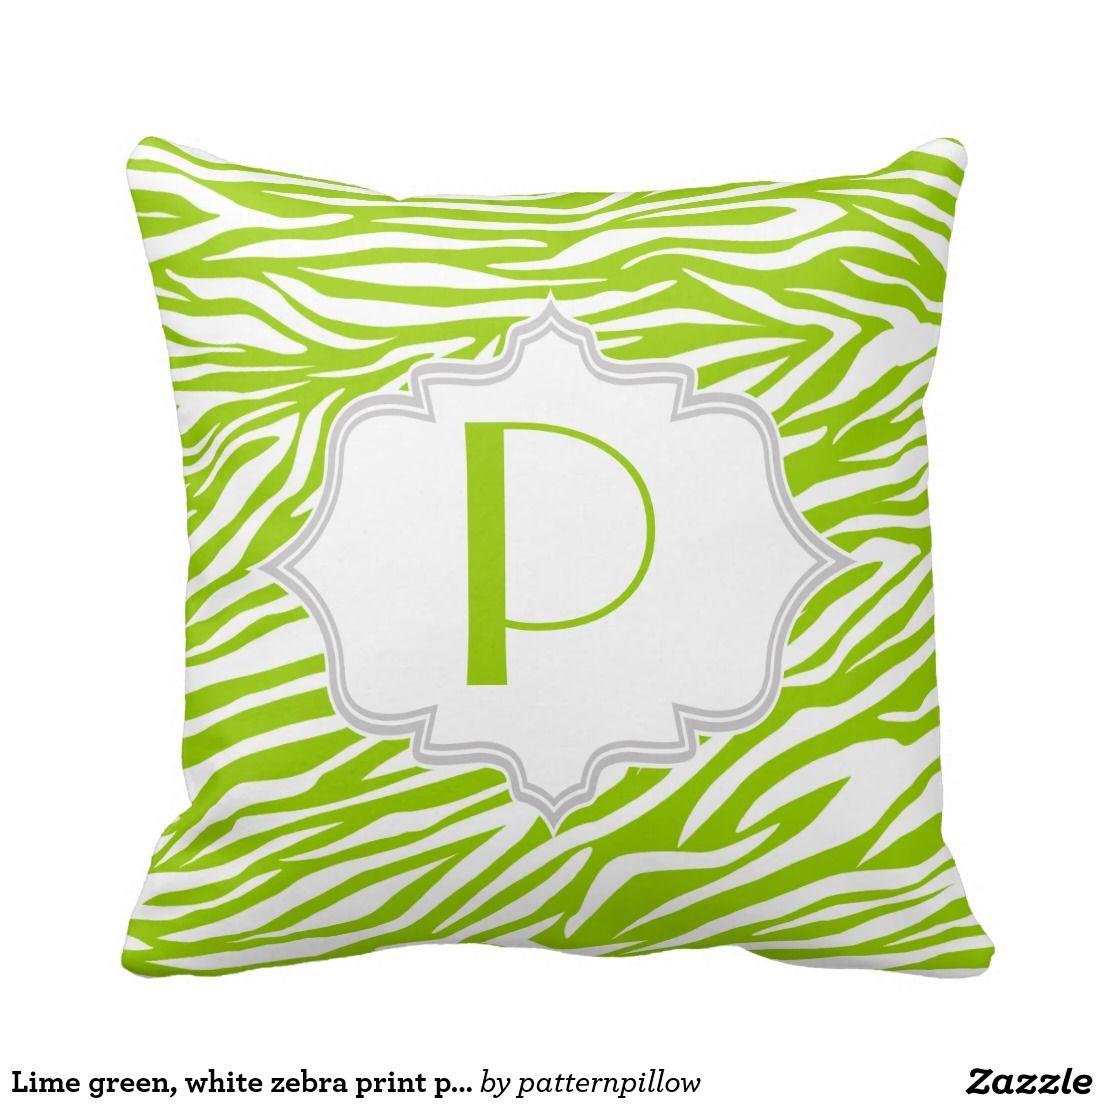 Lime green, white zebra print pattern custom throw pillow